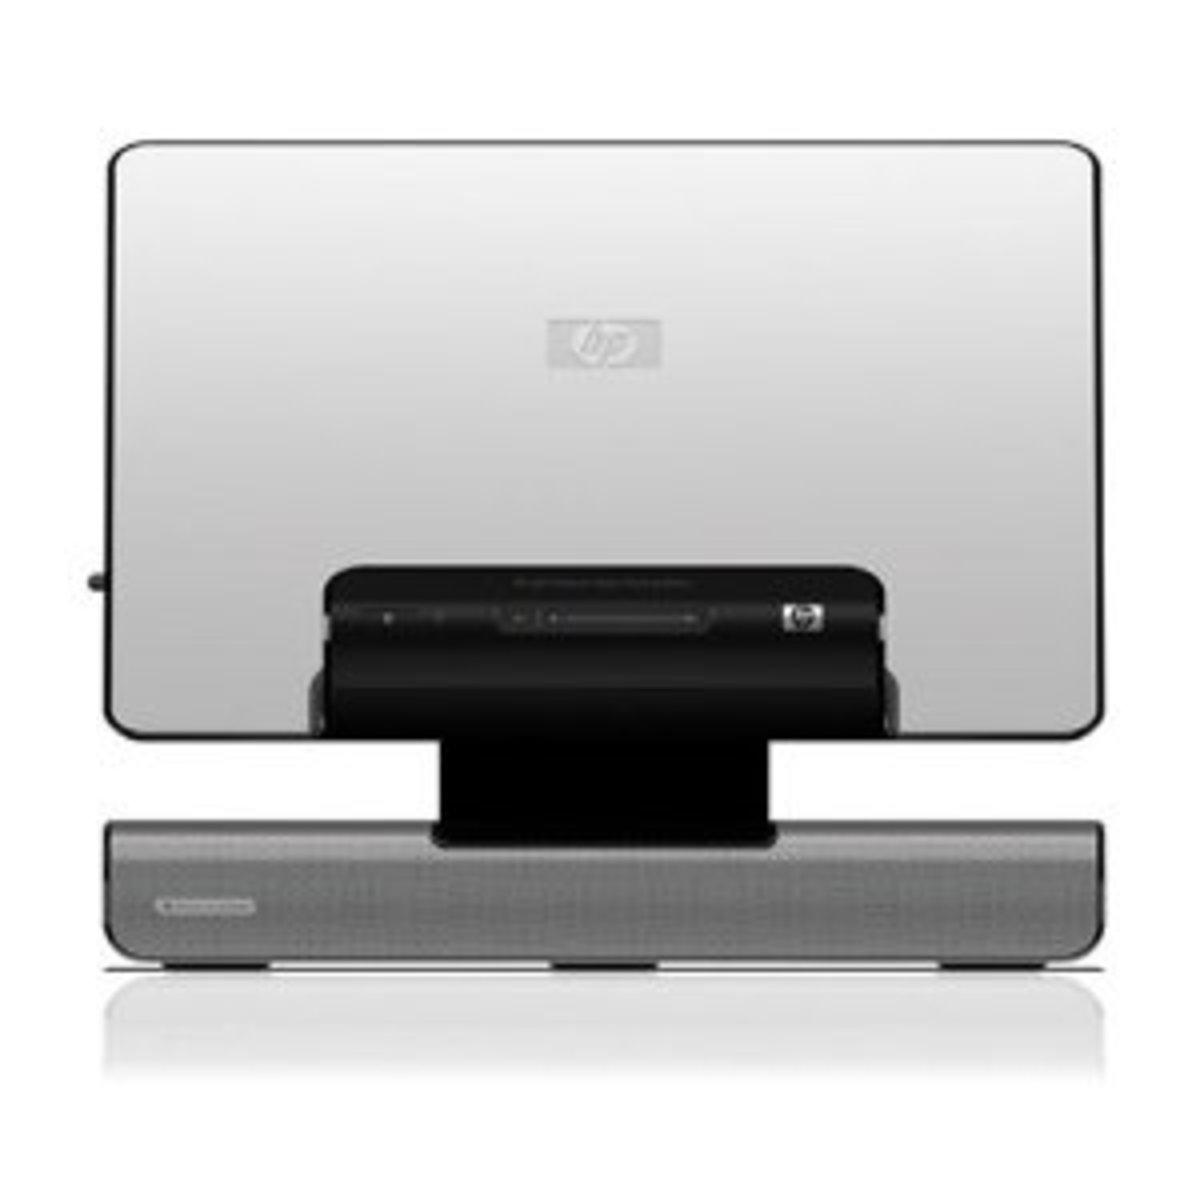 HP xb4 Notebook Media Docking Station